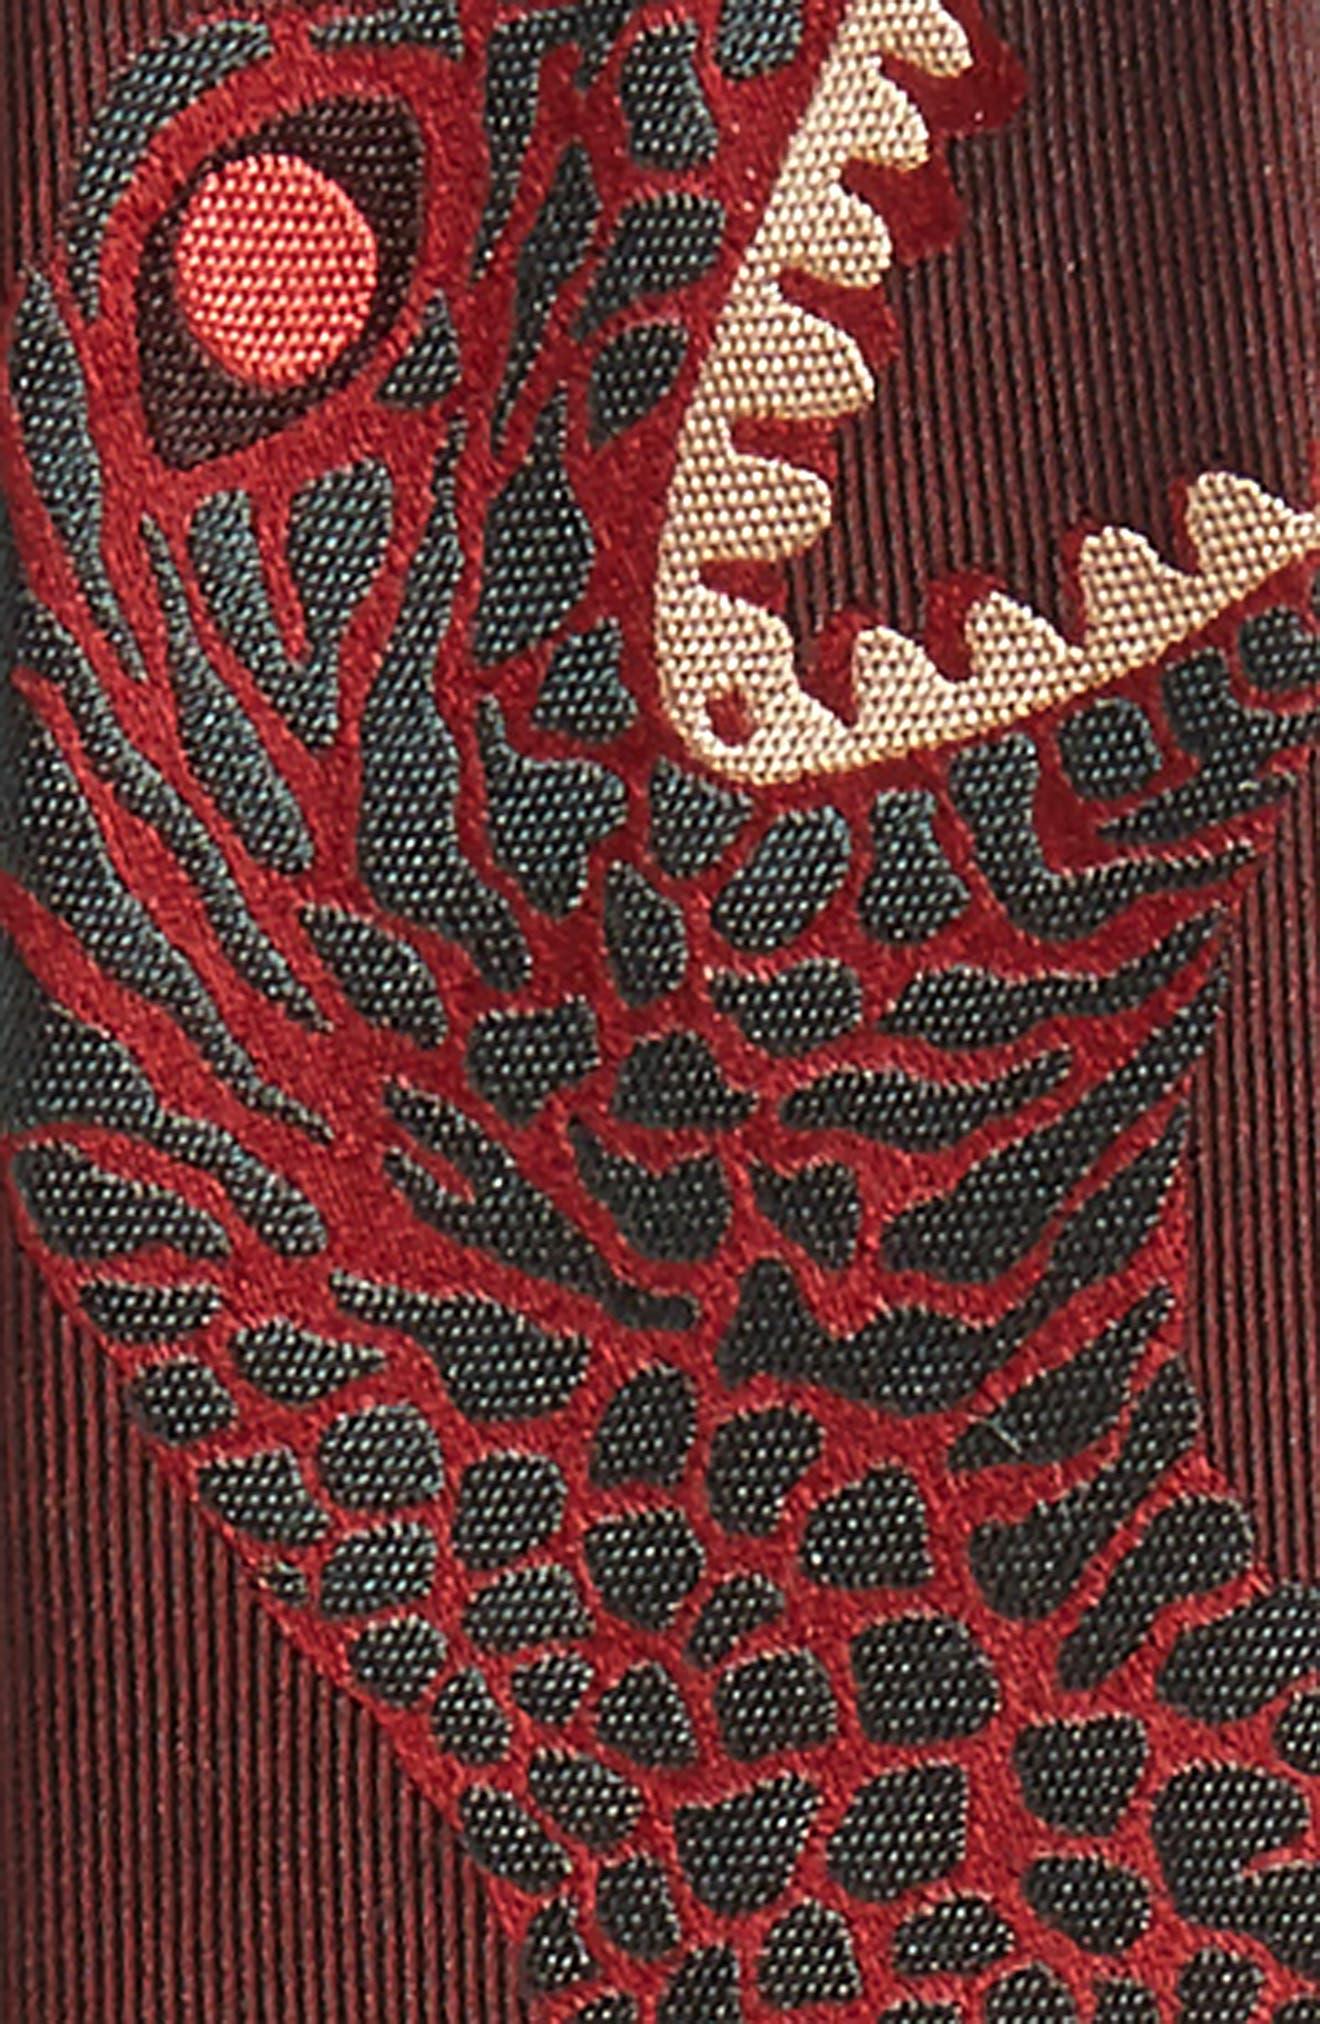 'Dinosaur' Silk Skinny Tie,                             Alternate thumbnail 3, color,                             200